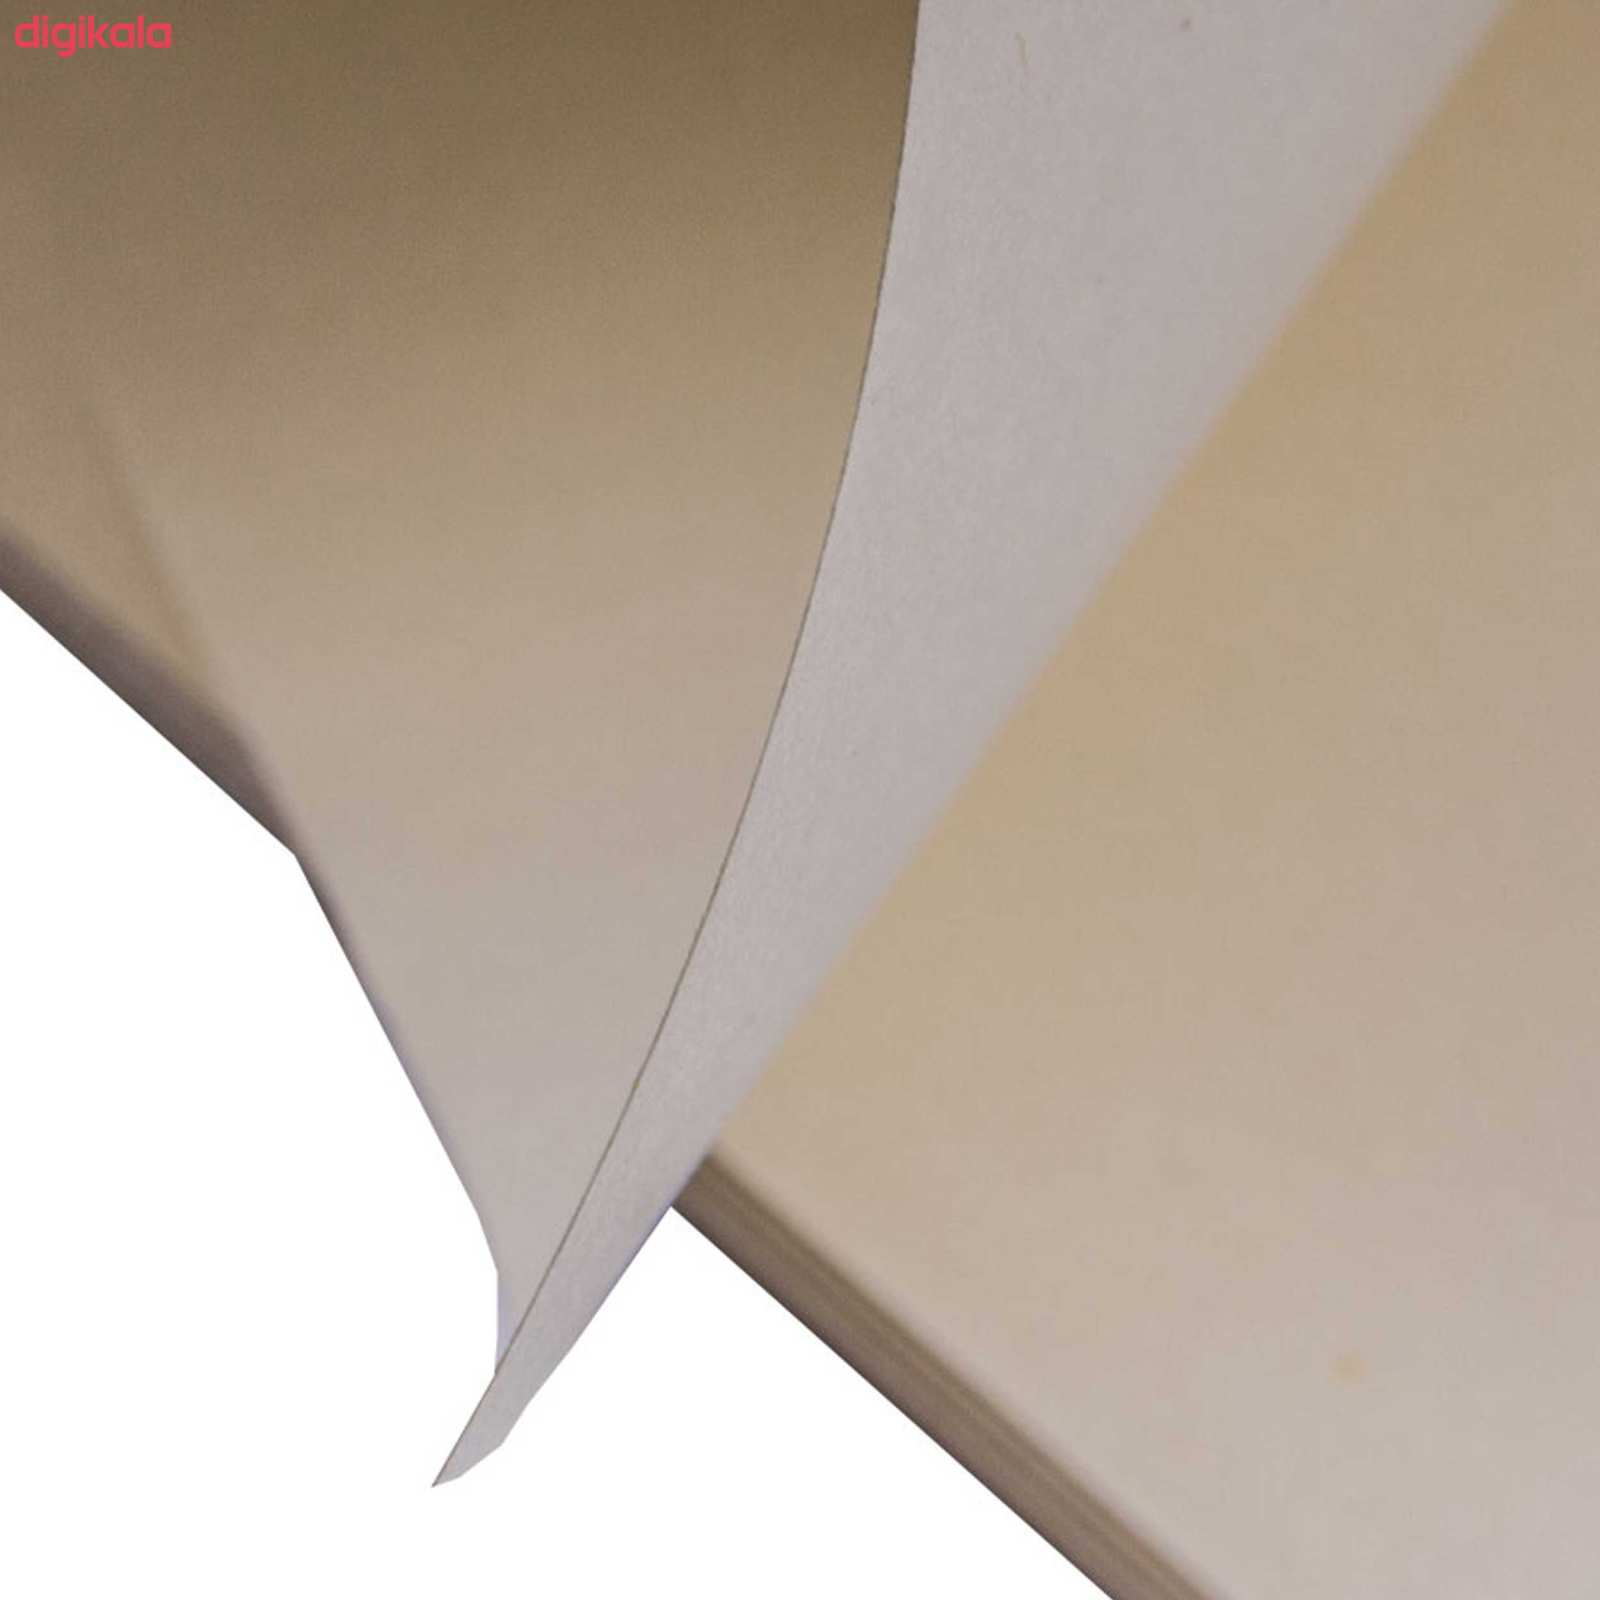 کاغذ طراحی A3 پارس کد 3042_75GR بسته 50 عددی  main 1 1